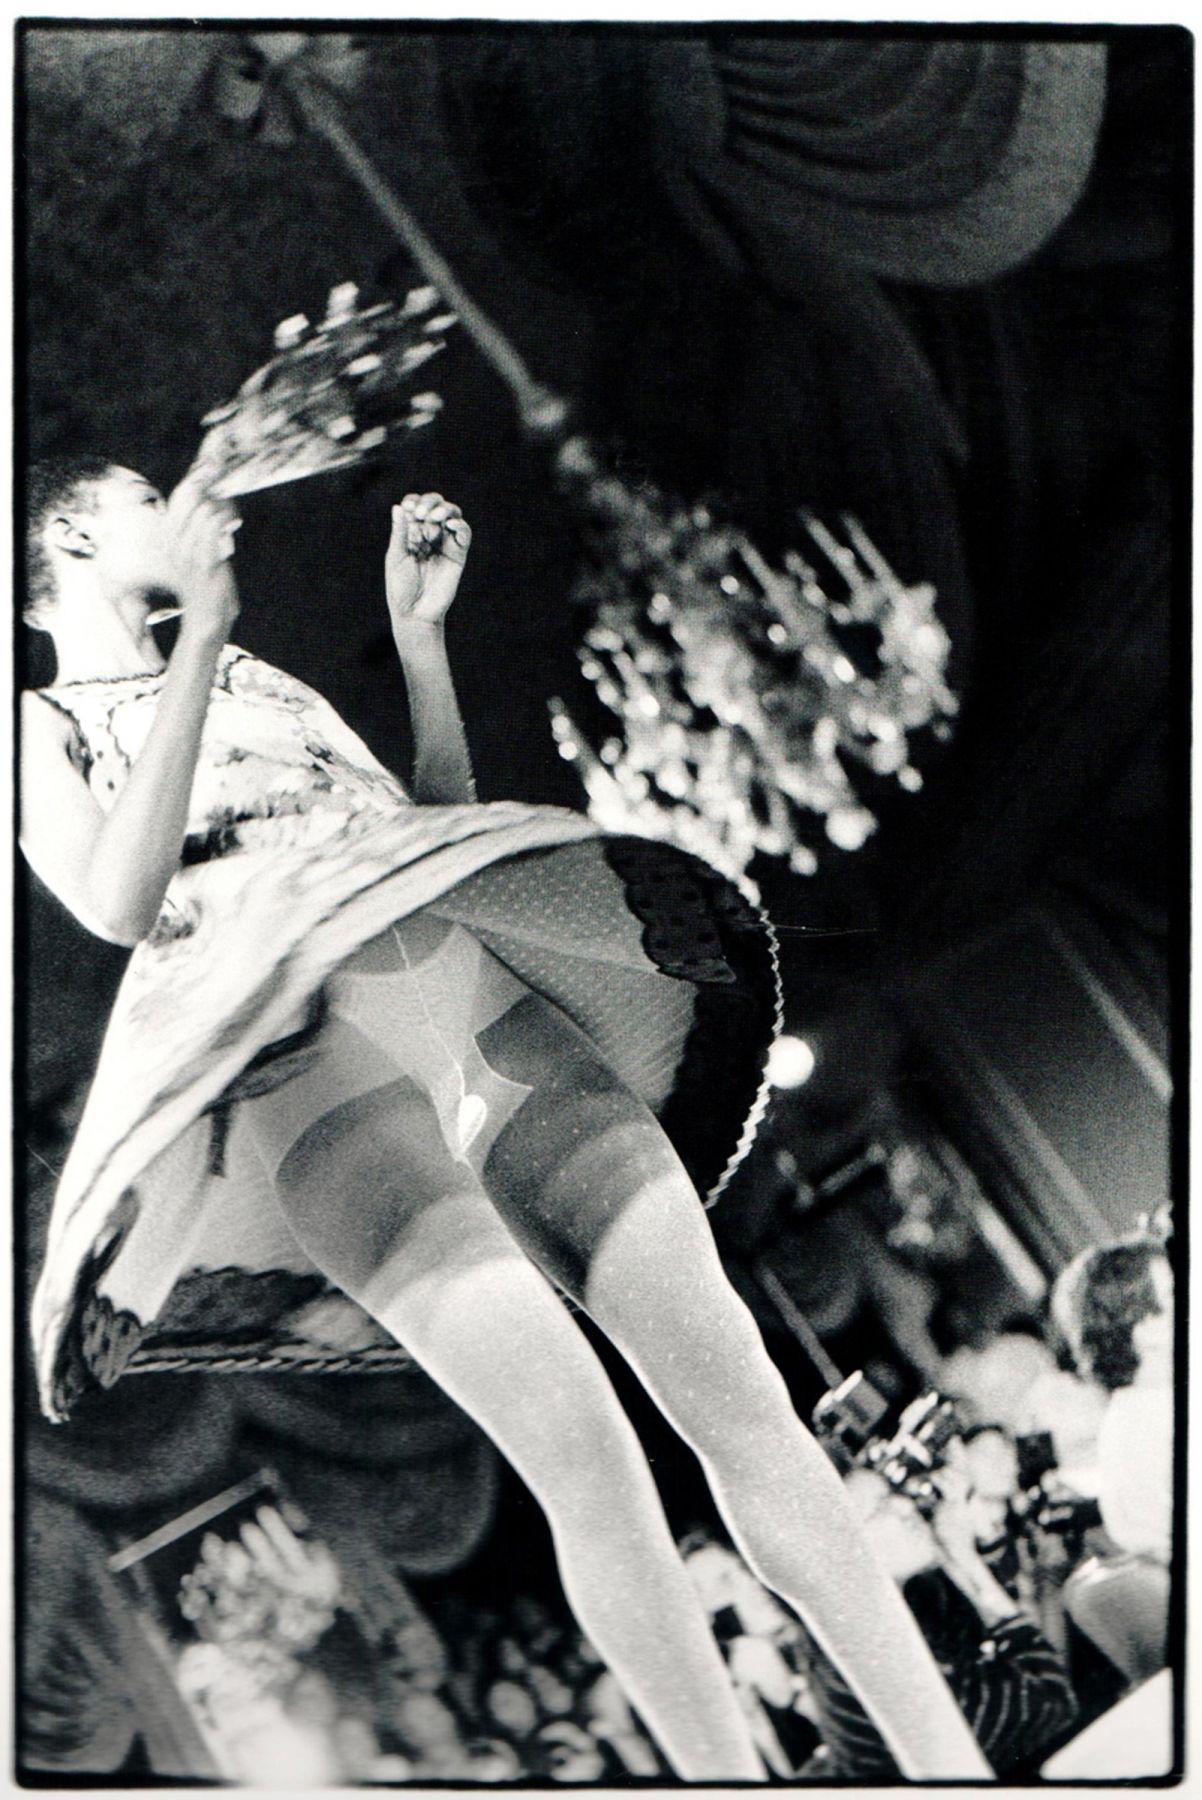 "ALT=""Zoe Leonard, Frontal View, Geoffrey Beene Fashion Show, 1990, Gelatin silver print"""